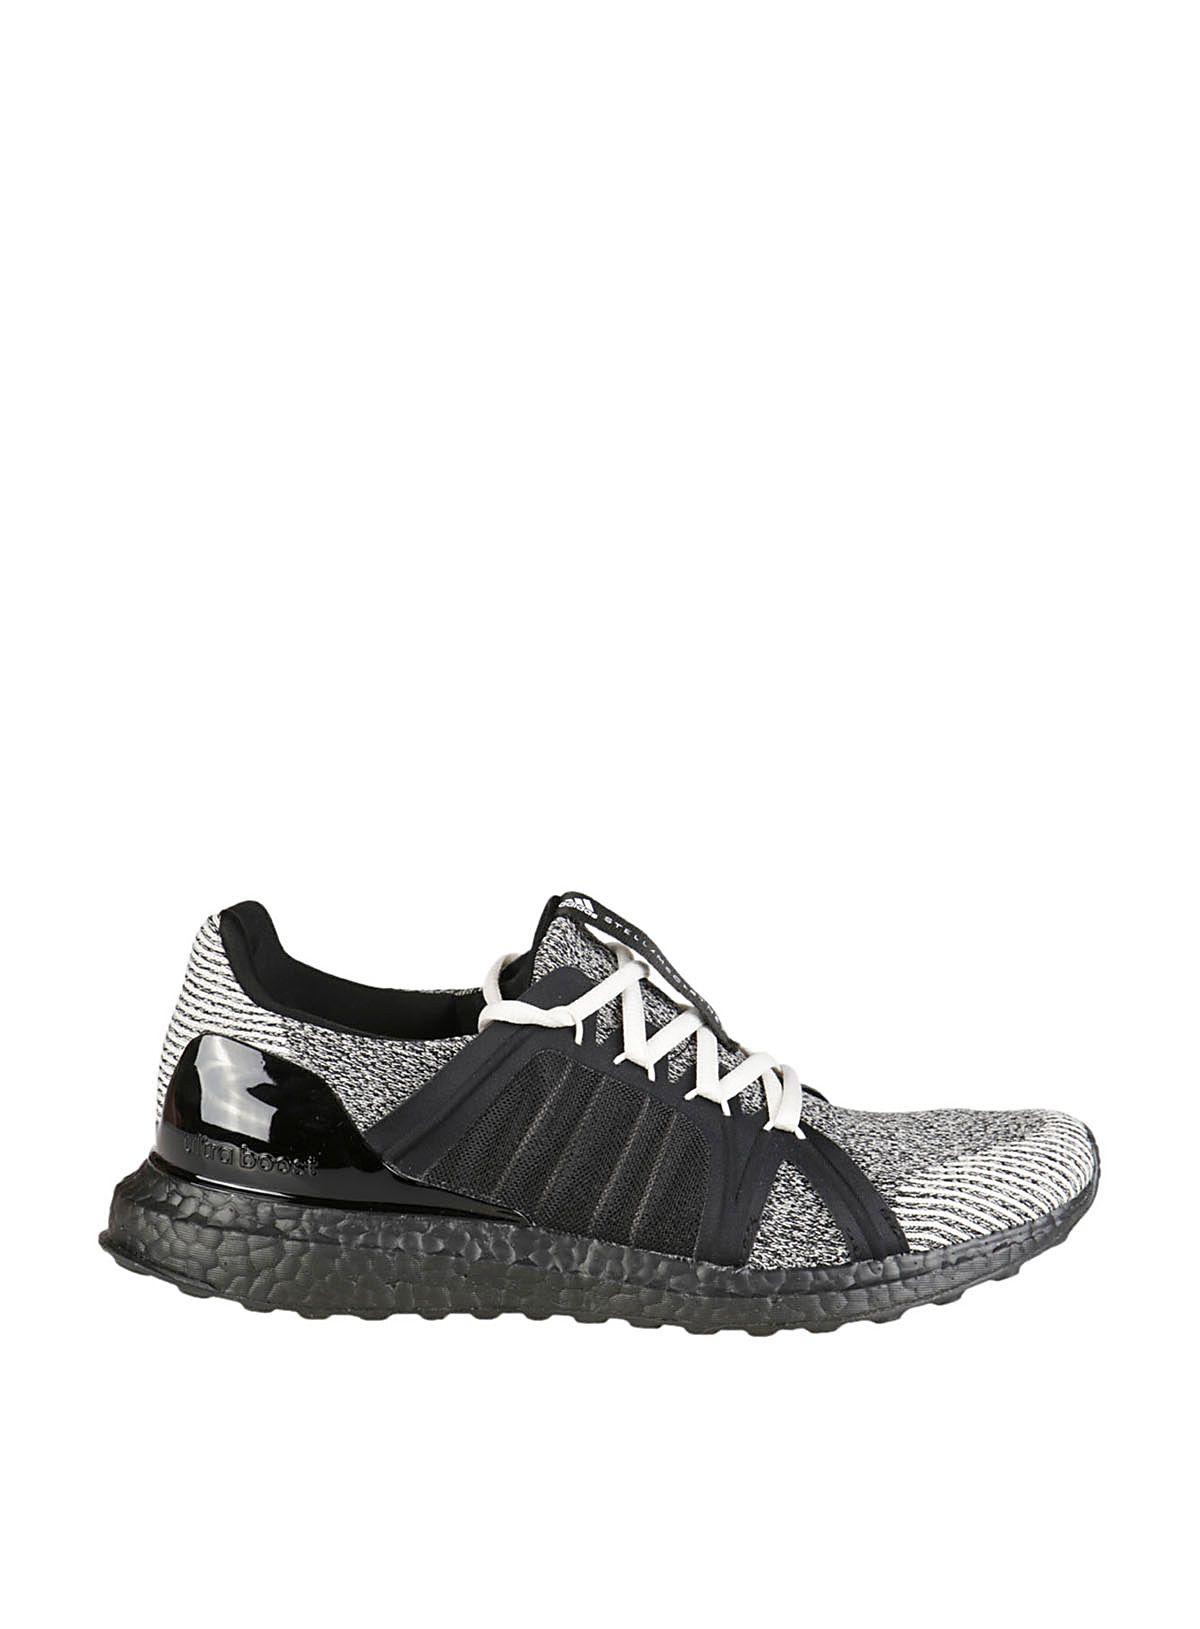 Adidas By Stella Mccartney Adidas By Stella Mccartney Ultra Boost Sneakers